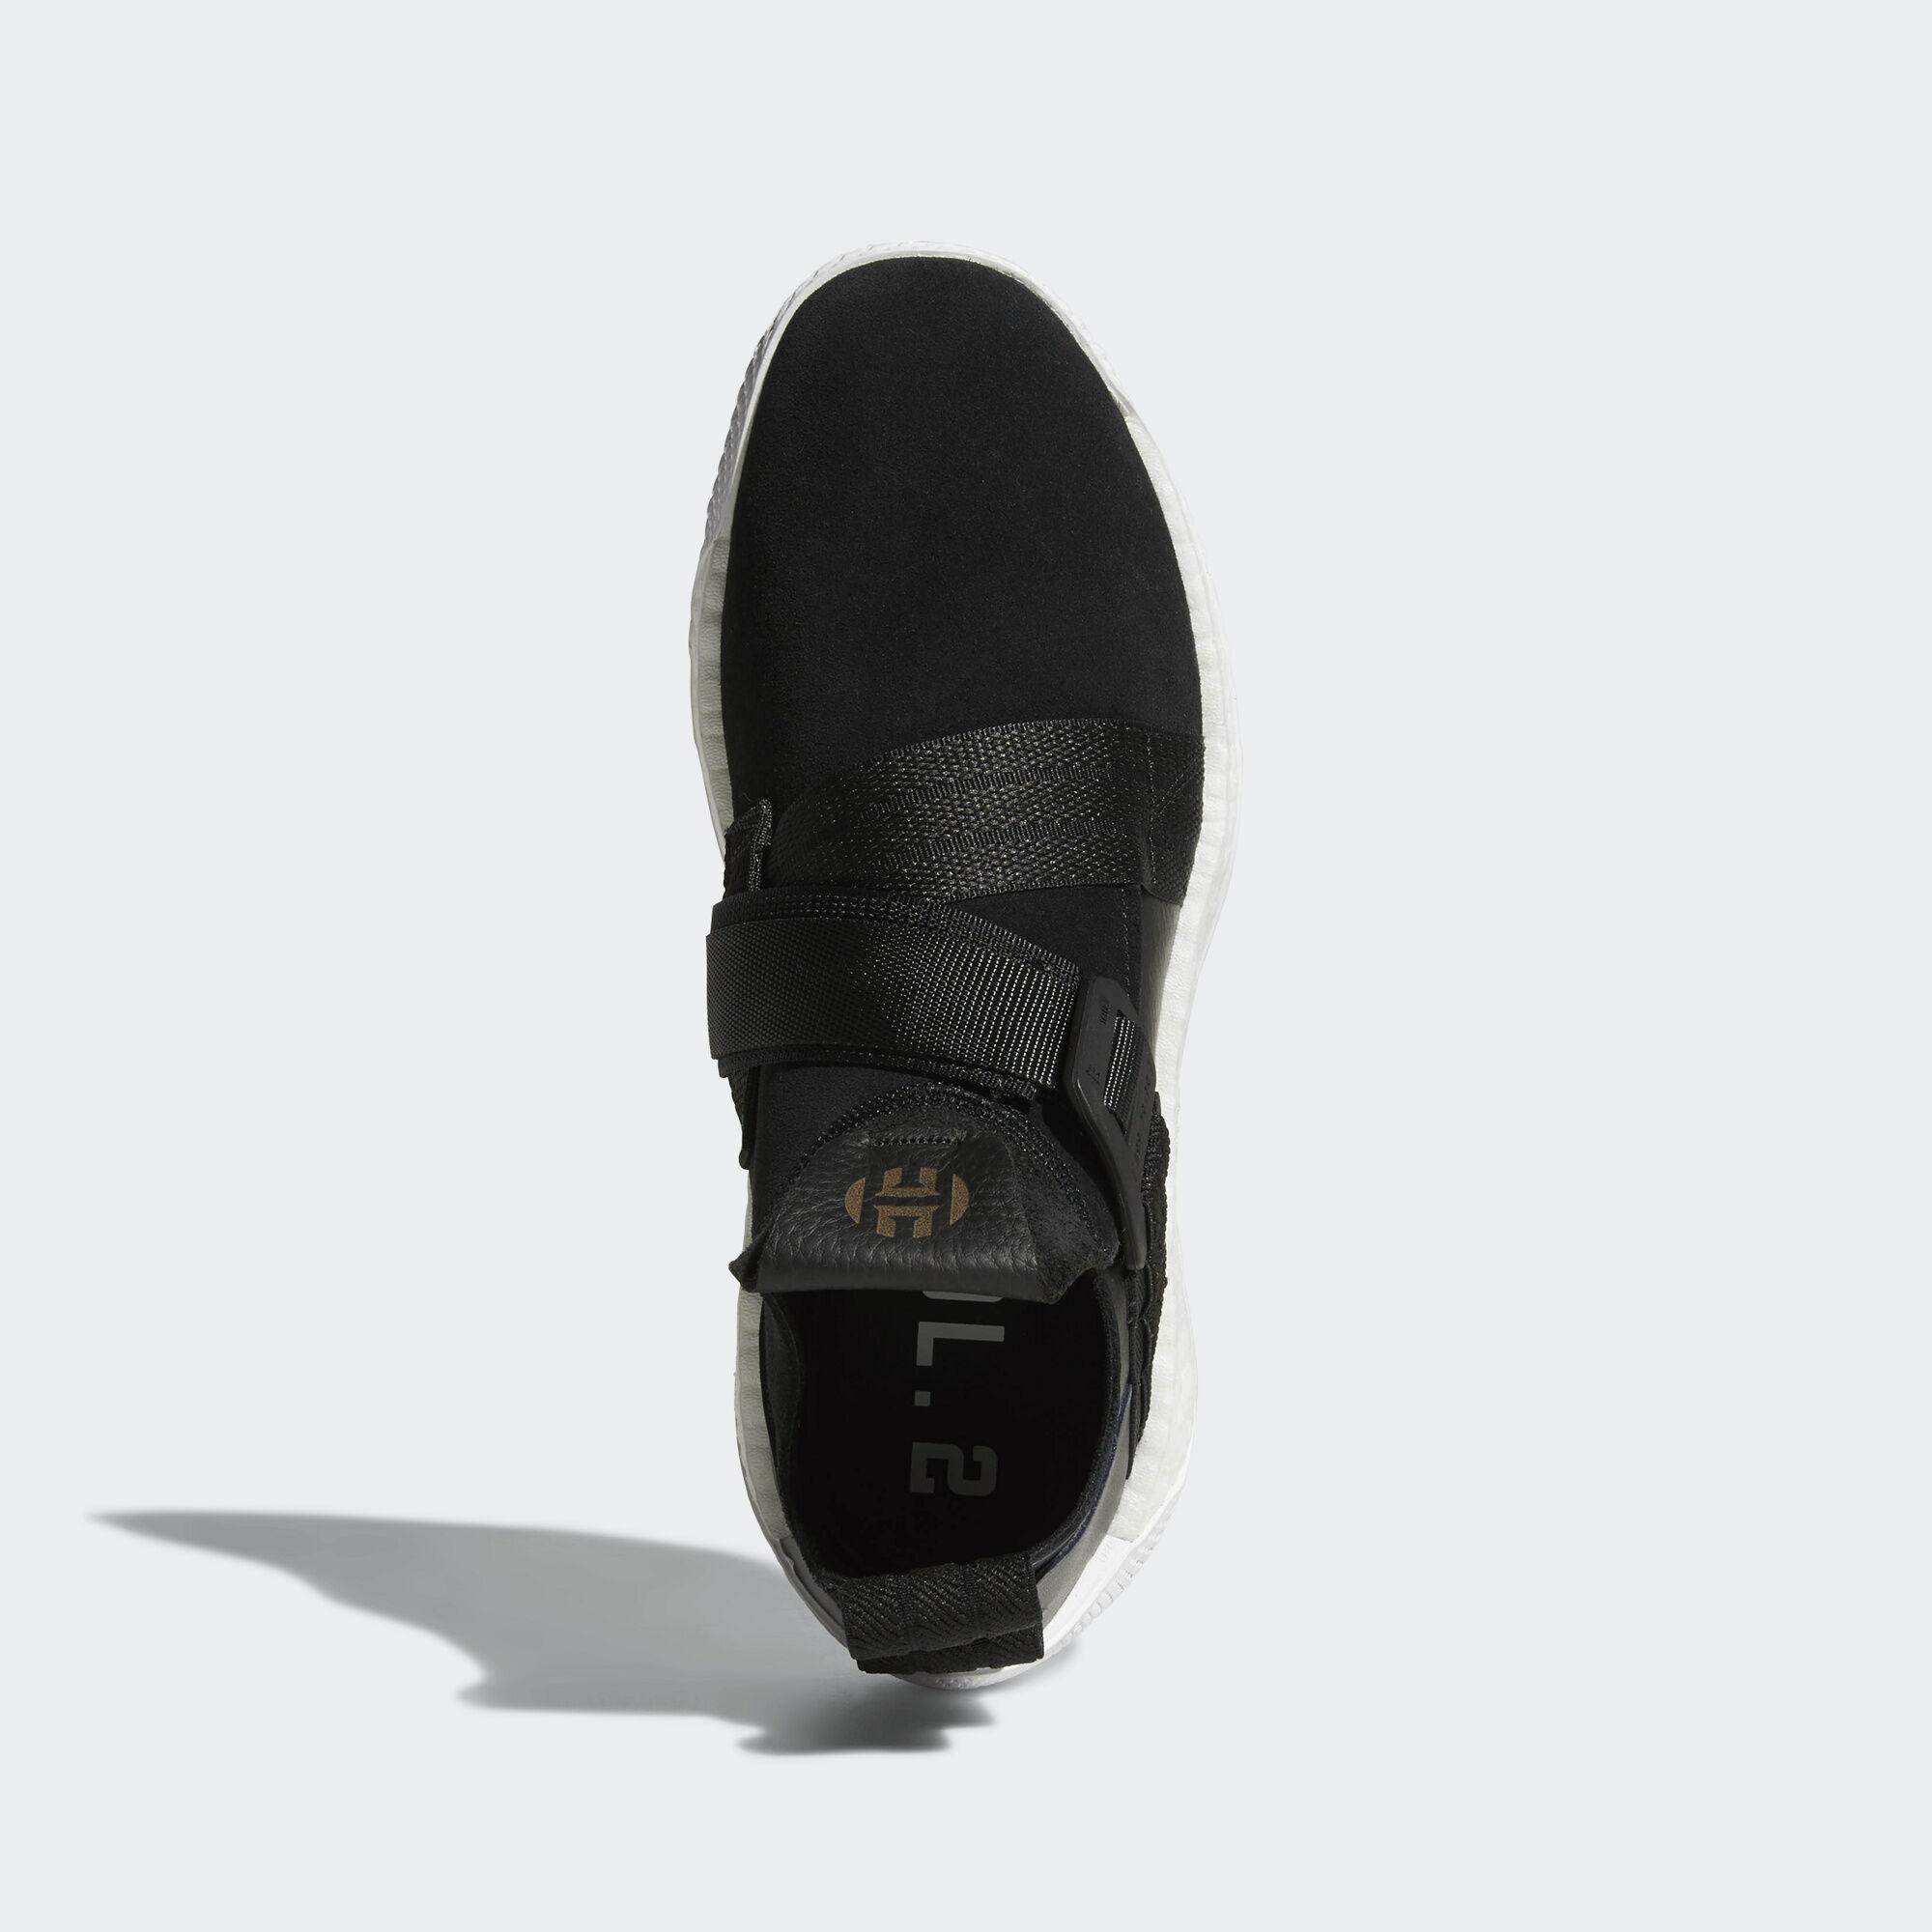 48d27dacbb5 adidas Harden Vol. 2 LS Shoes - Black